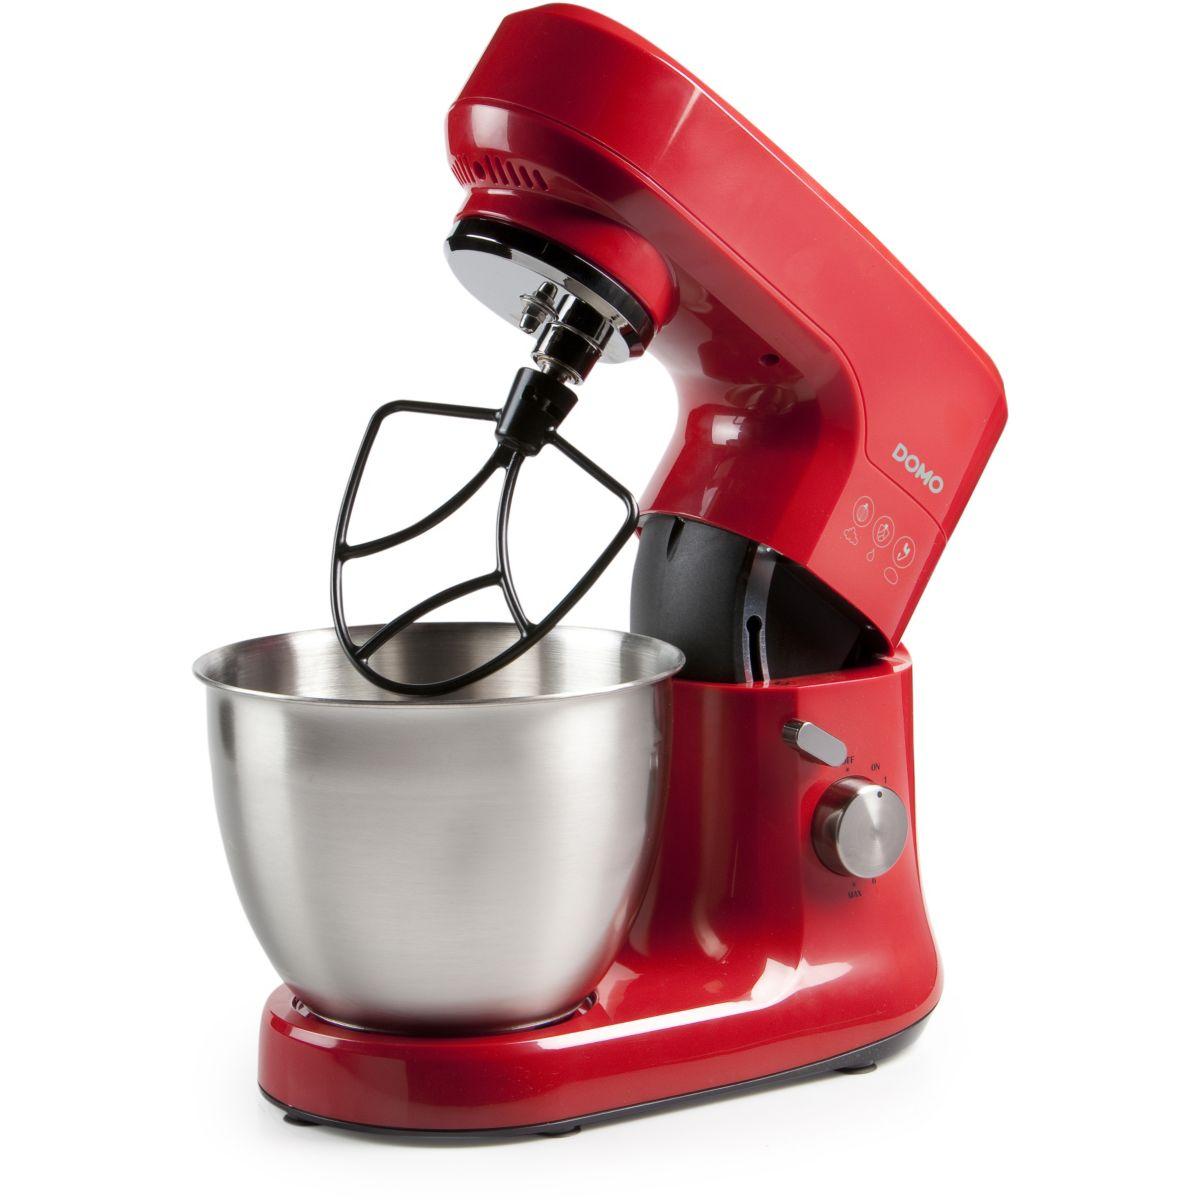 Domo do9109kr robot de cuisine comparer avec for Prix robot cuisine